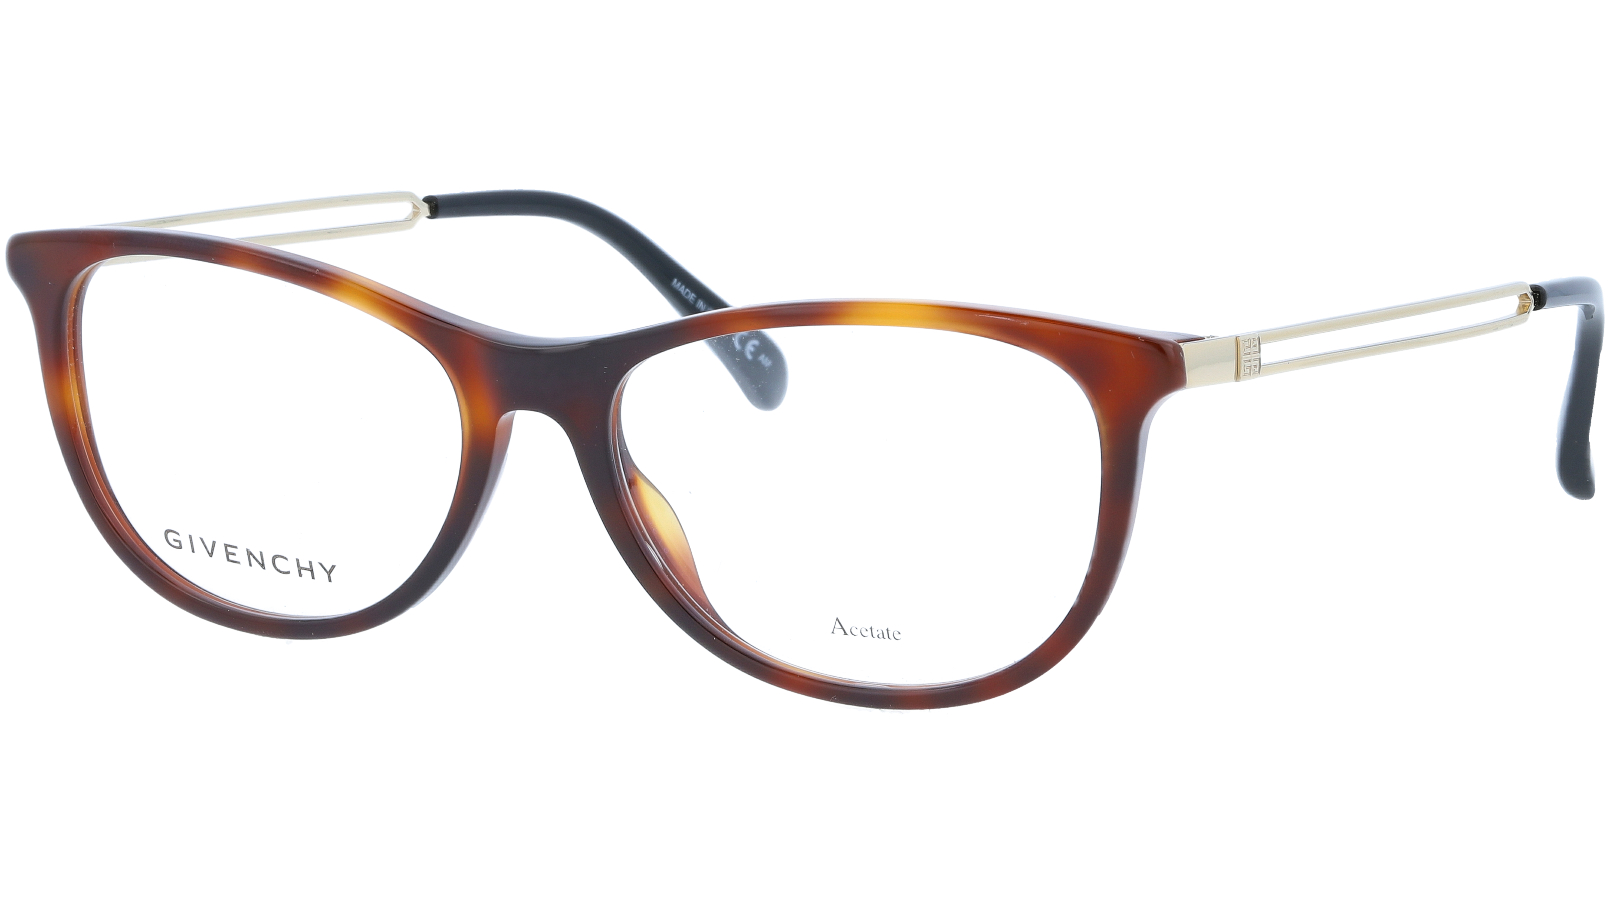 GIVENCHY GV0109 086 53 DARK Glasses